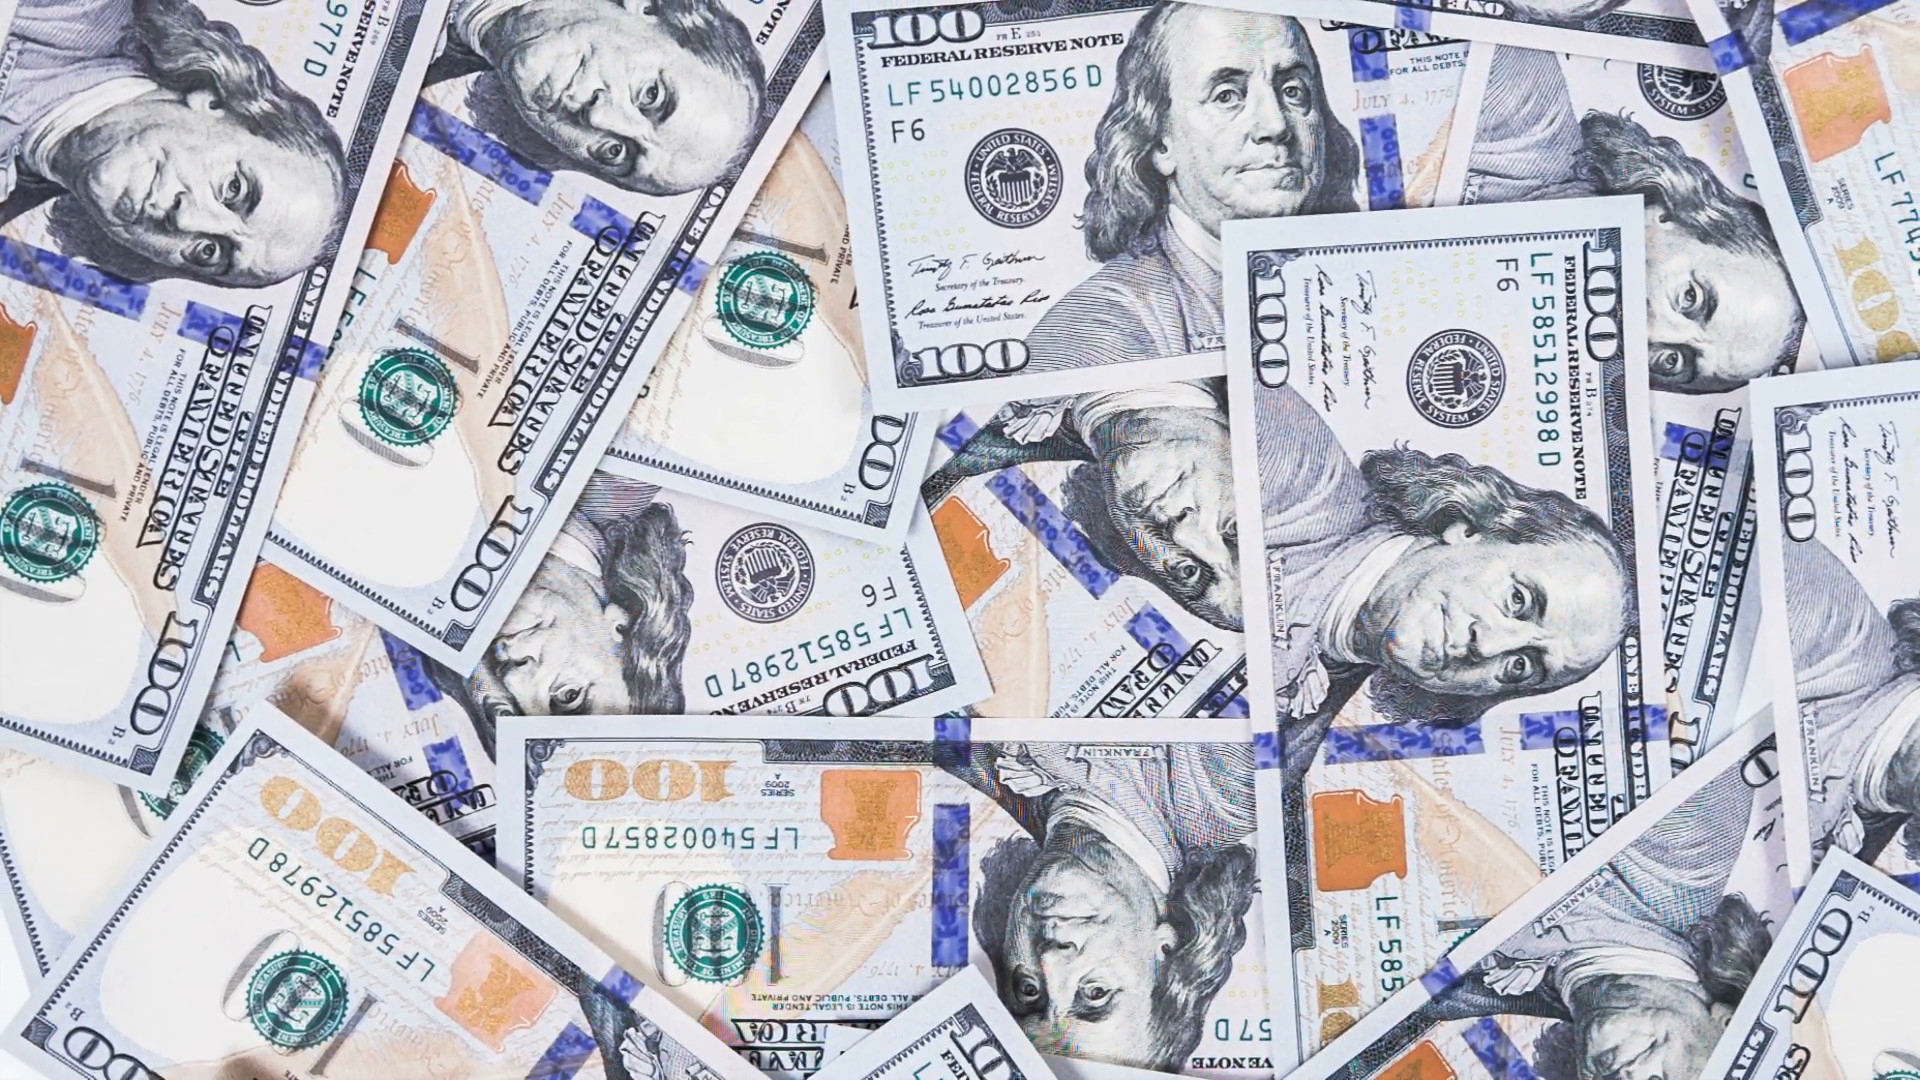 51+ dollar bill wallpapers on wallpaperplay